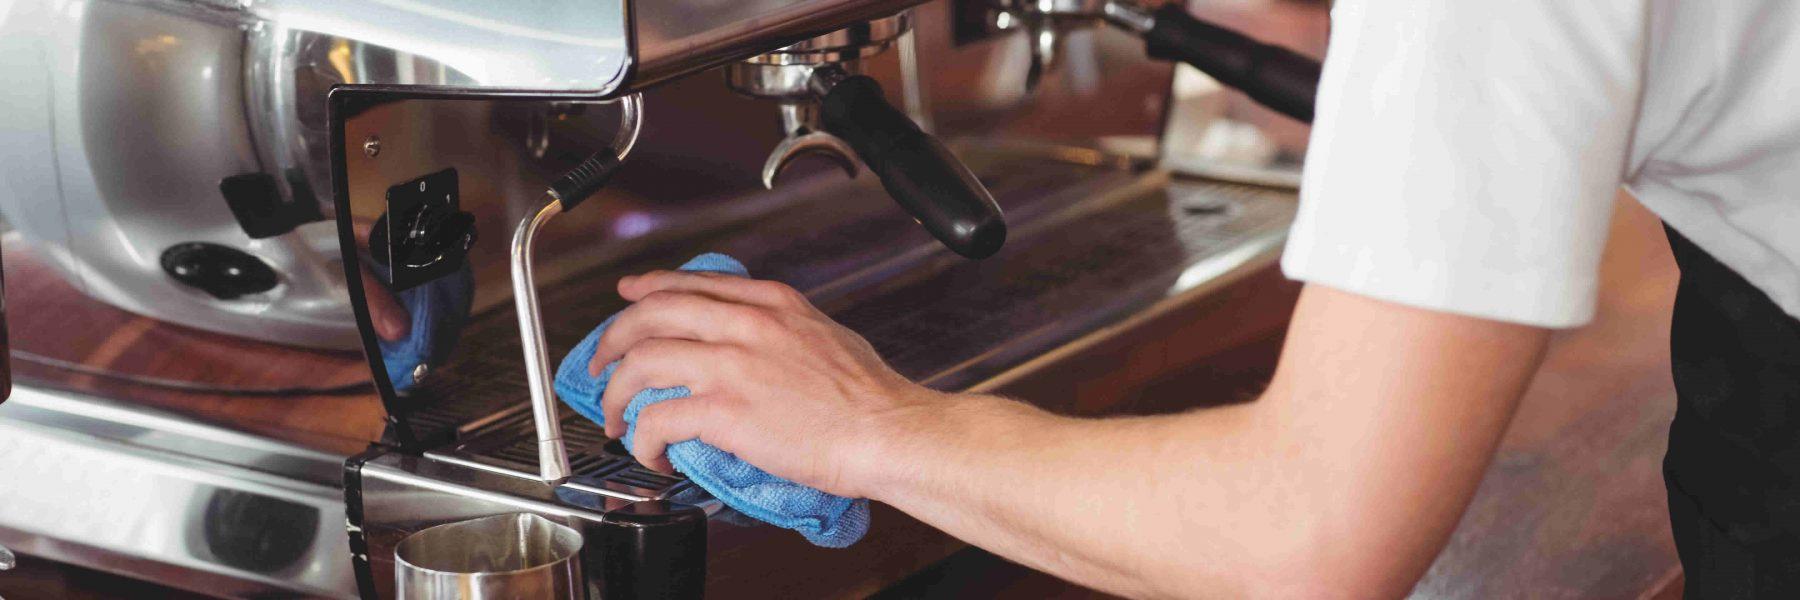 Coffee machine, barista maintenance and support